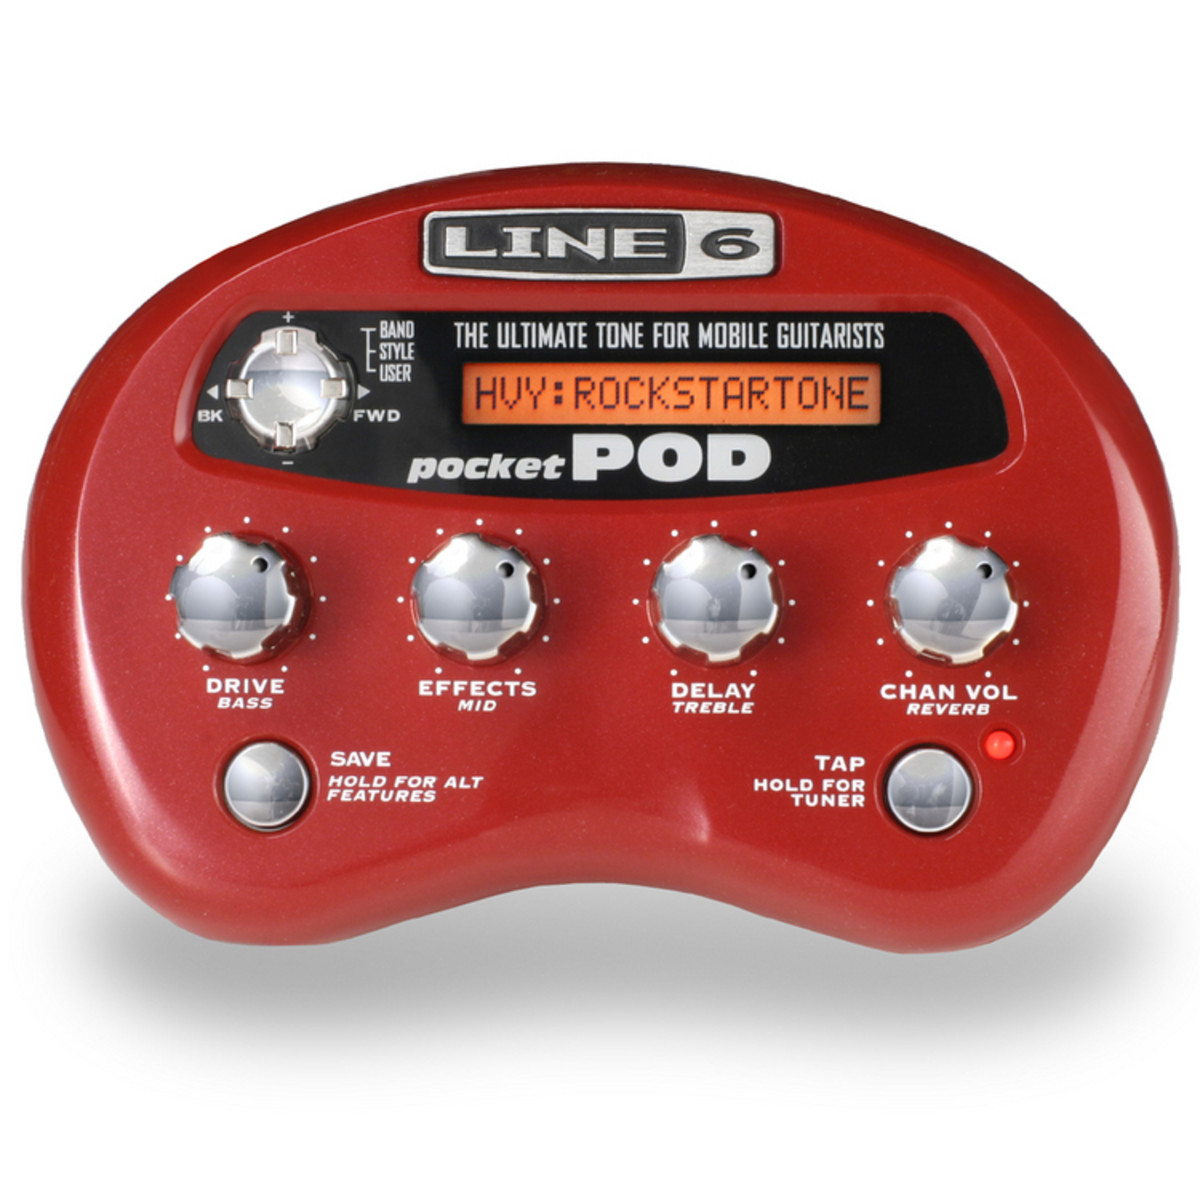 Line 6 Pocket POD Guitar Multi-Effects Processor 1